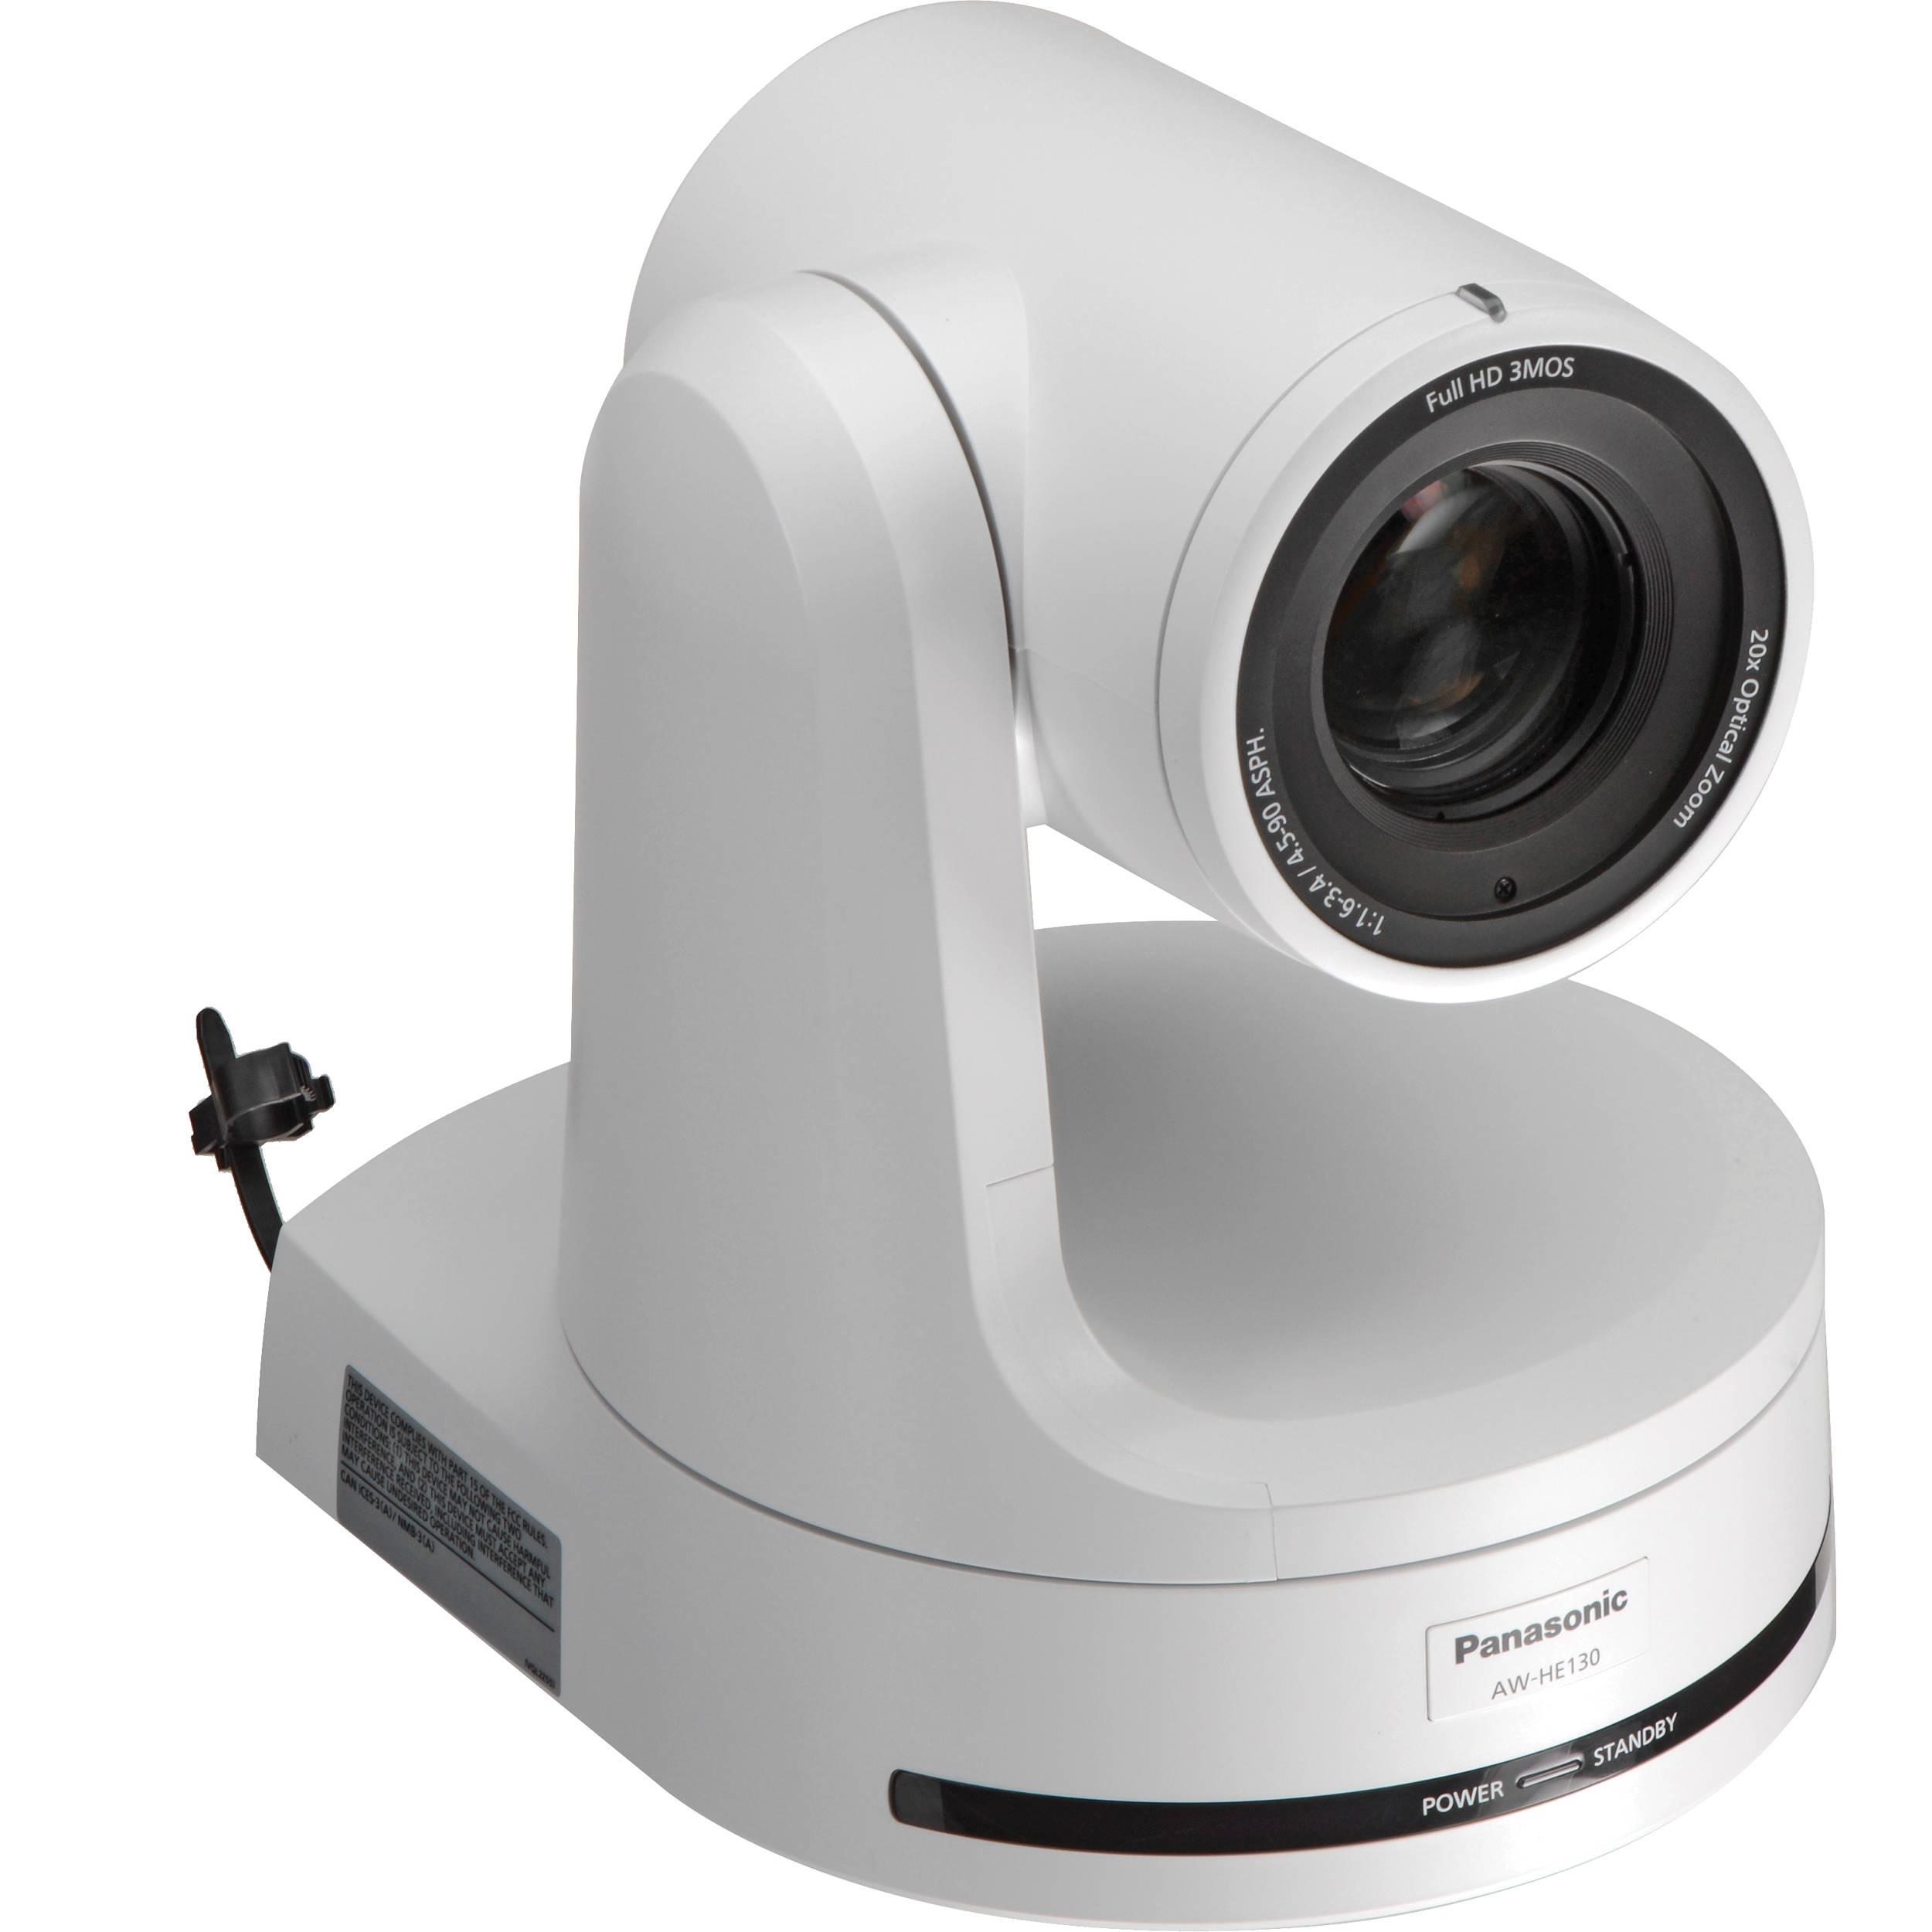 Panasonic Aw He130 Hd Integrated Camera White Aw